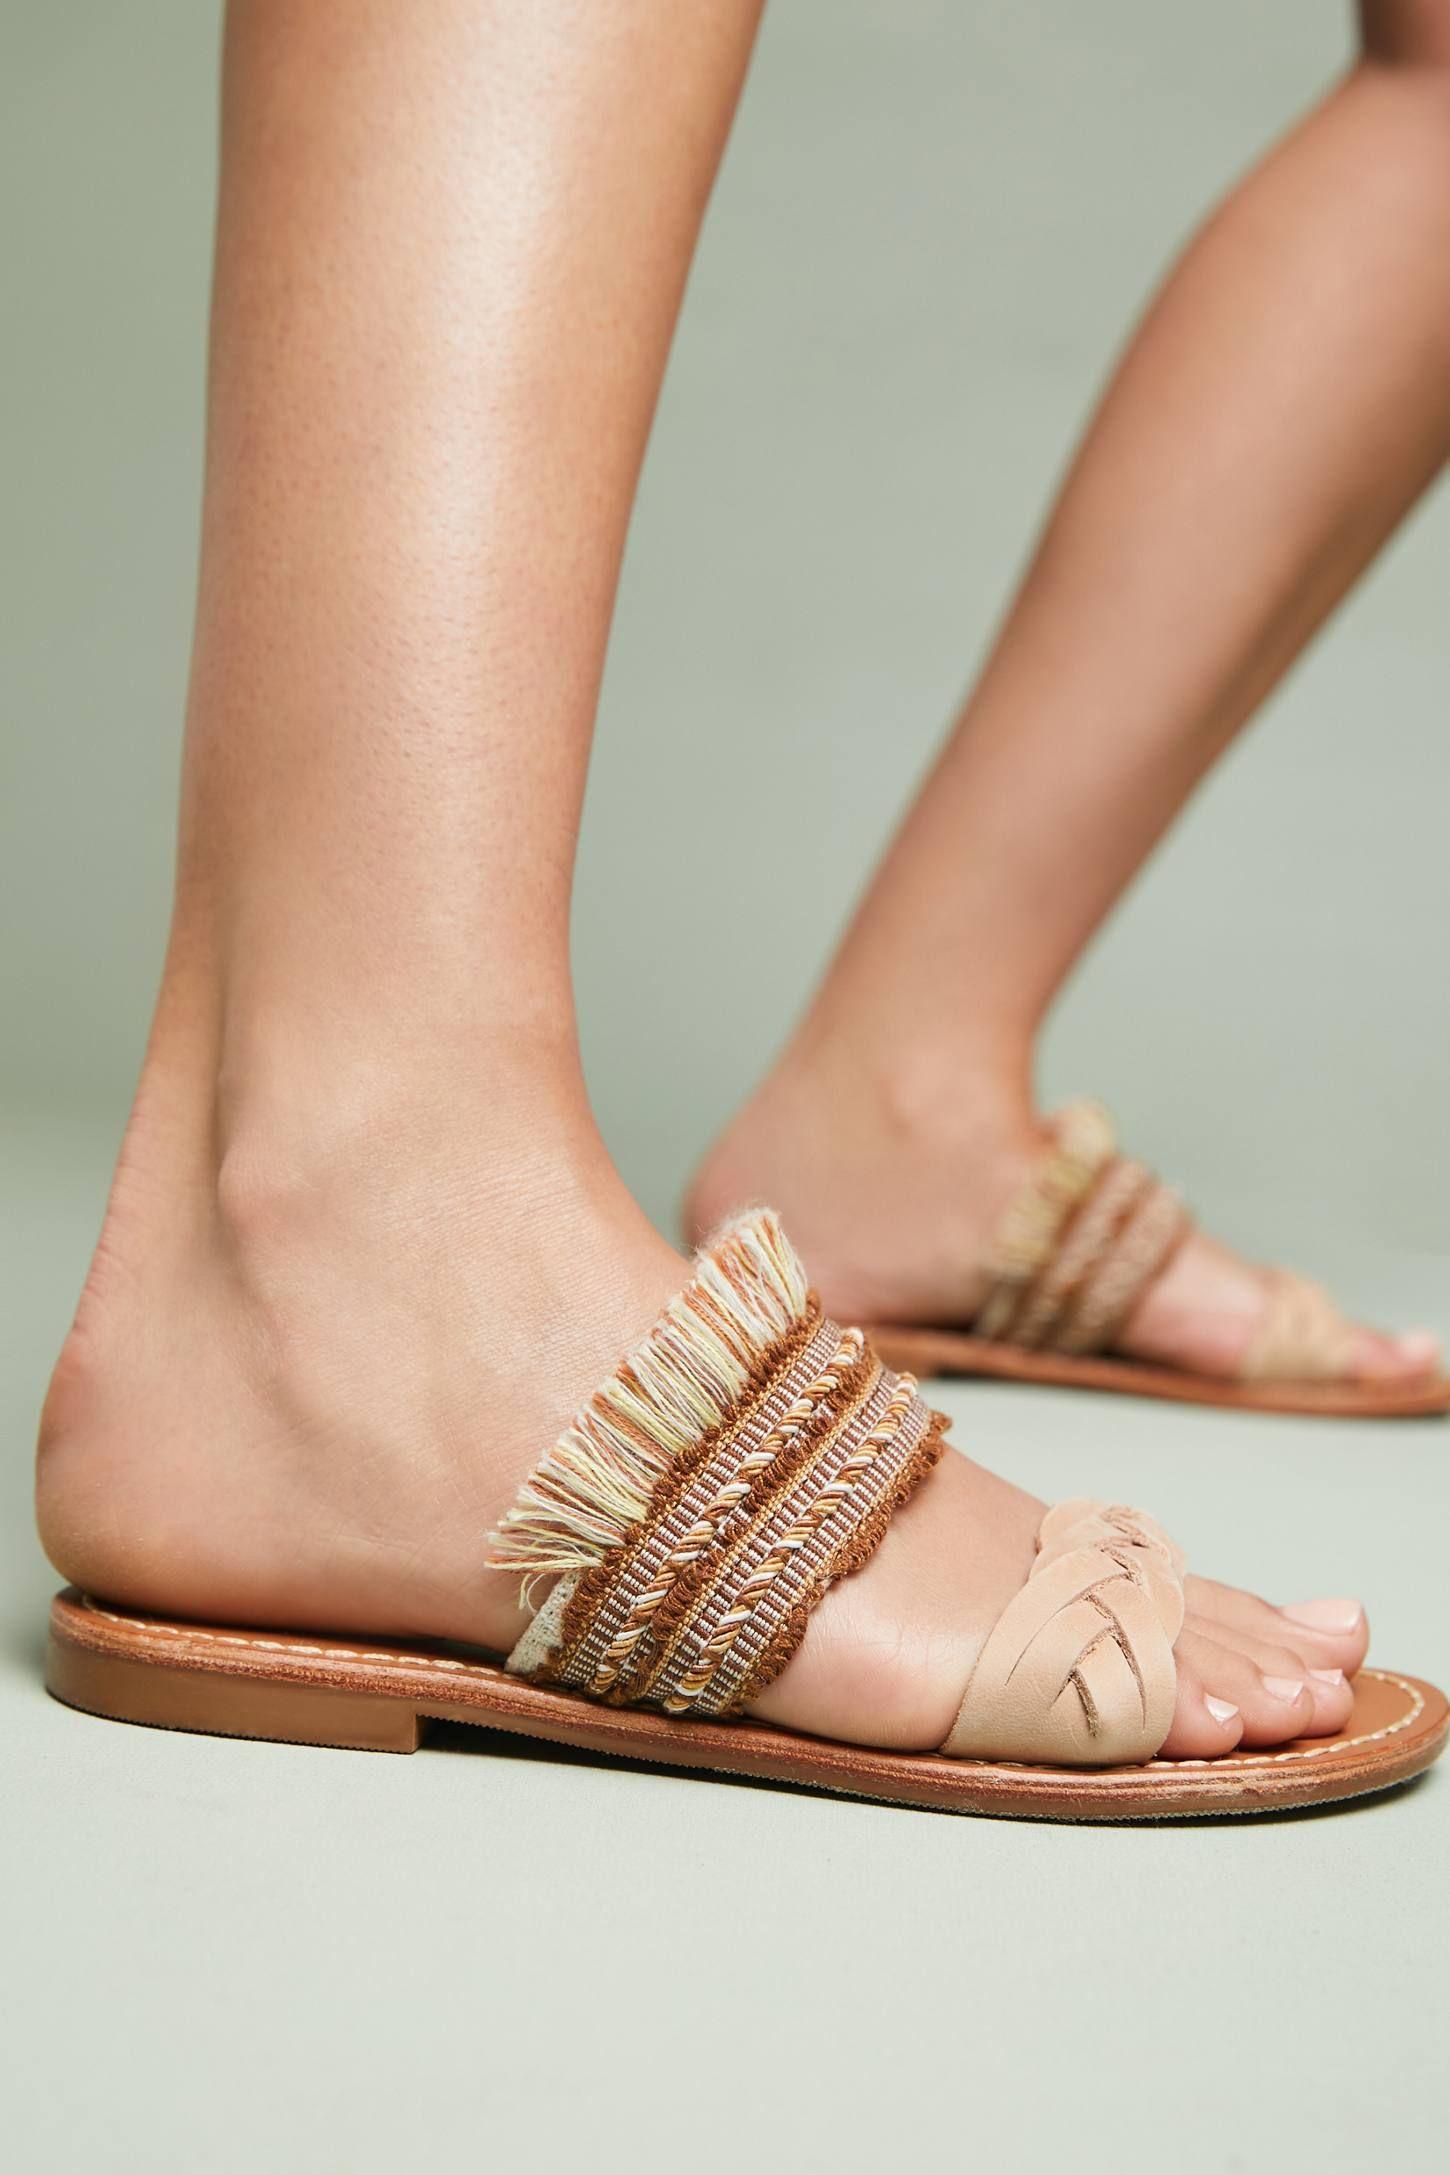 19fcb96dbe30 Soludos x Anthropologie Panarea Braided Slide Sandals